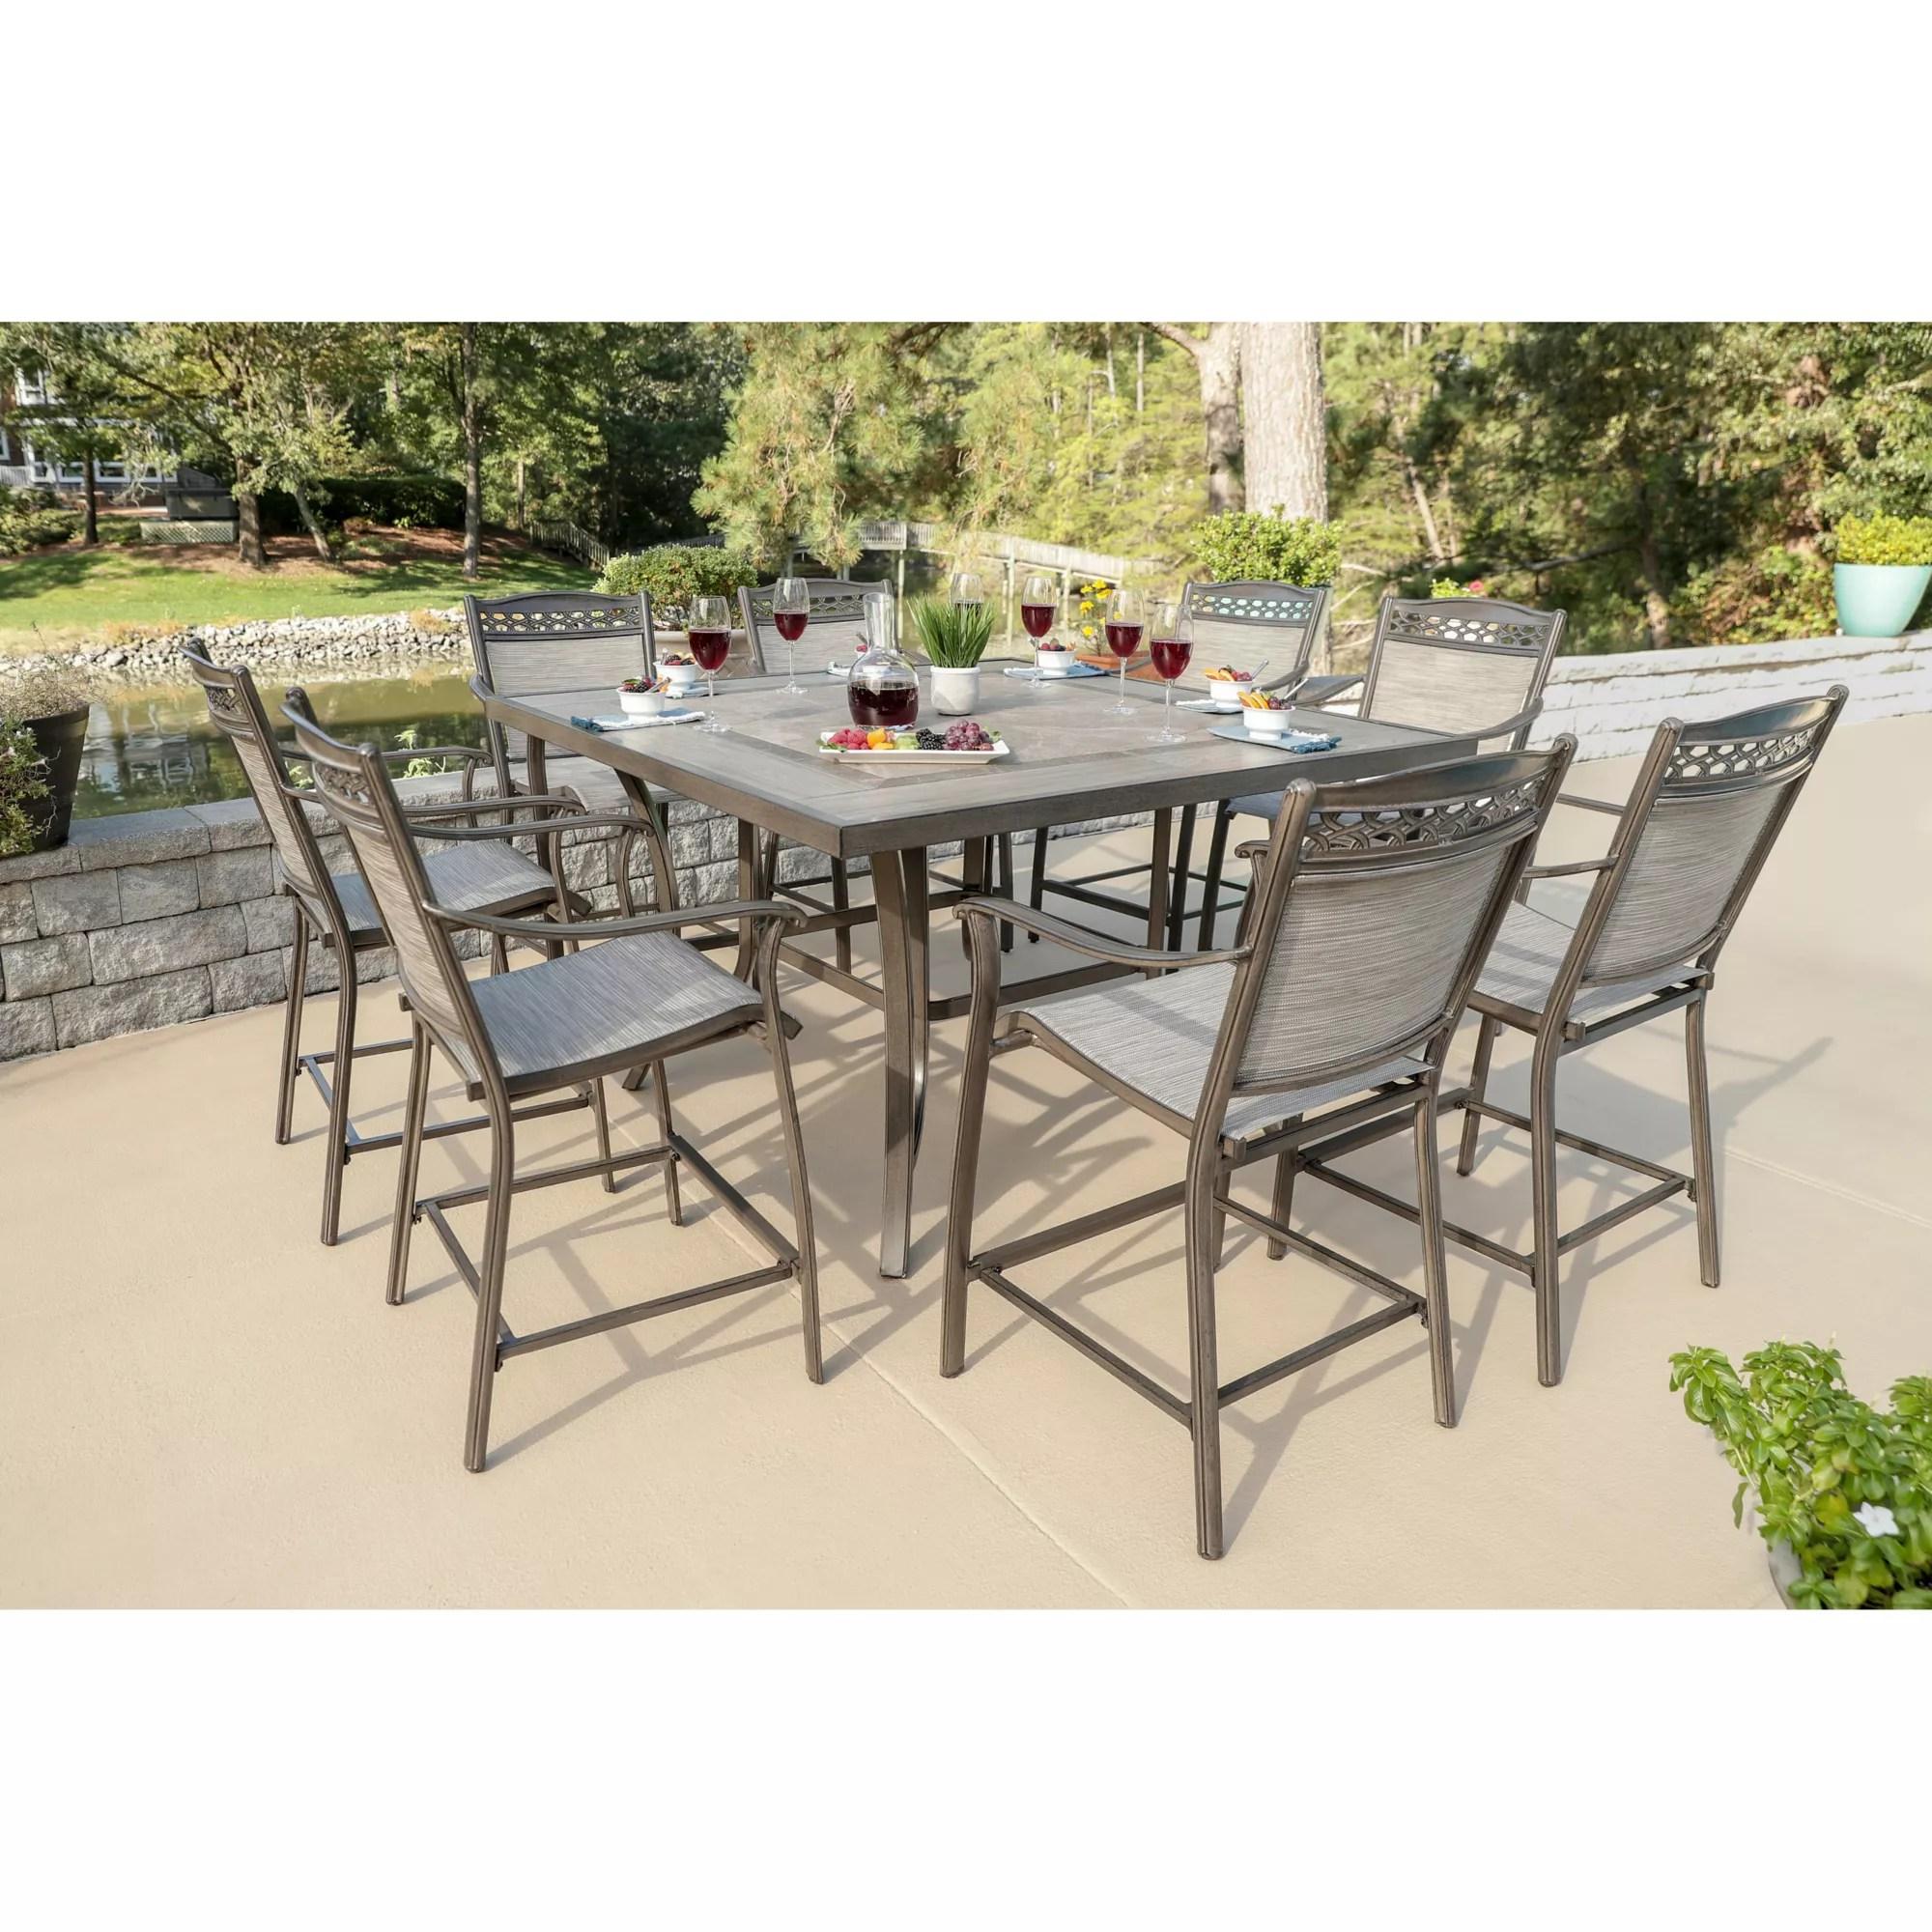 berkley jensen stone harbor 9pc aluminum high dining set